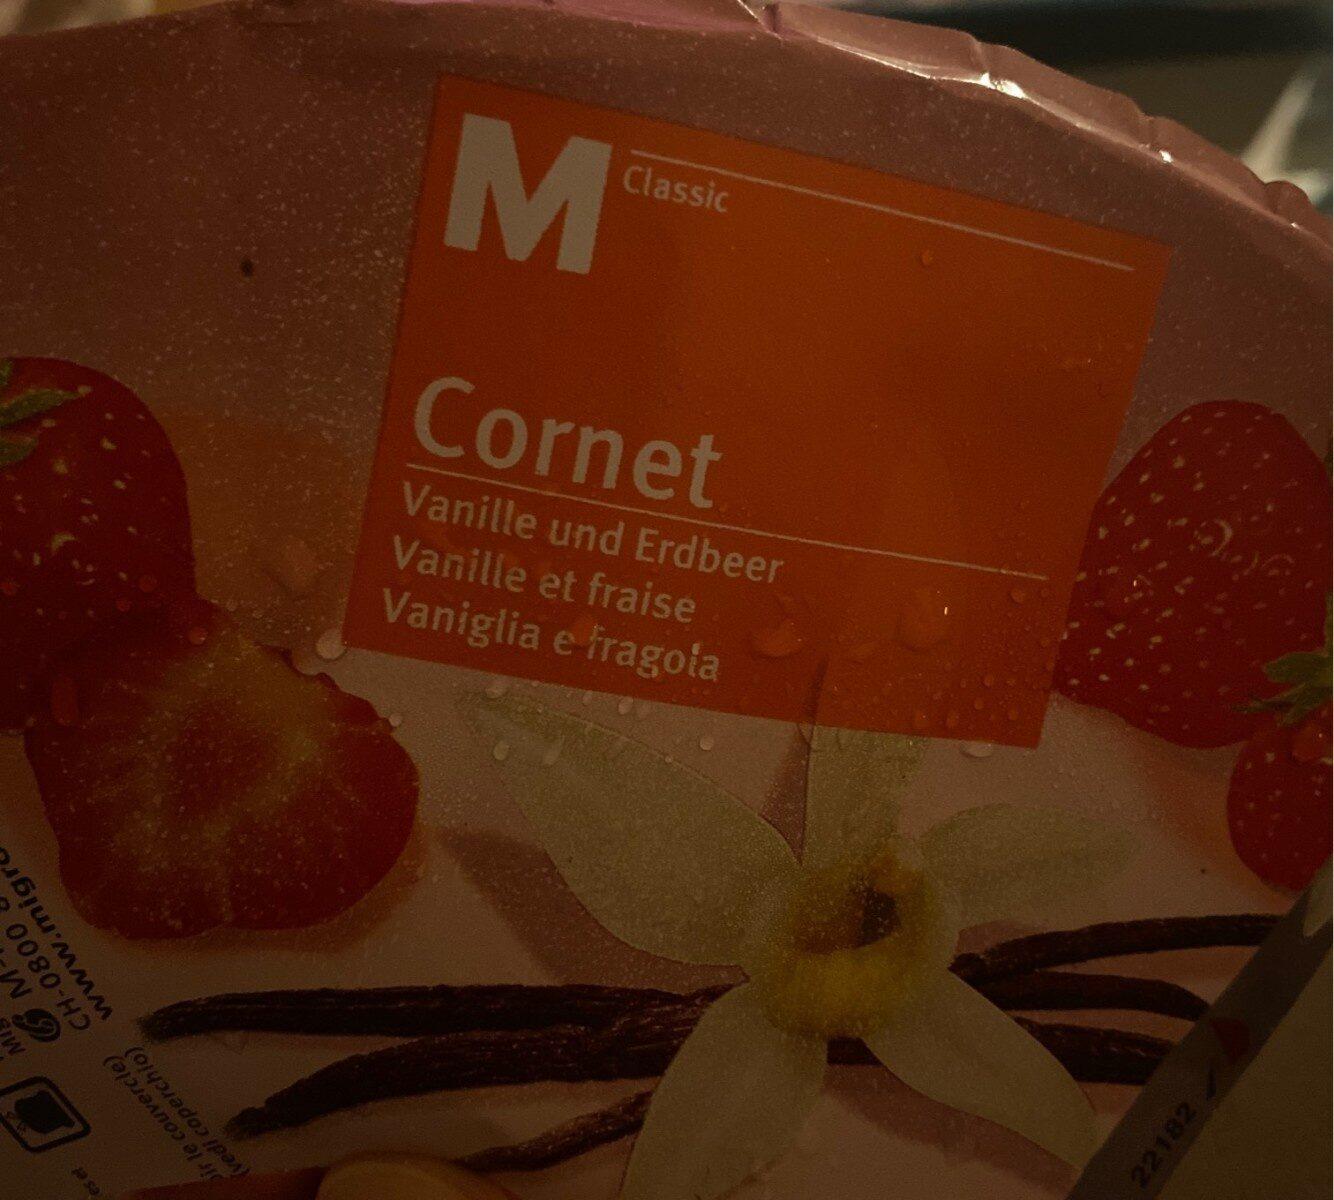 Cornet Vanille et fraise - Product